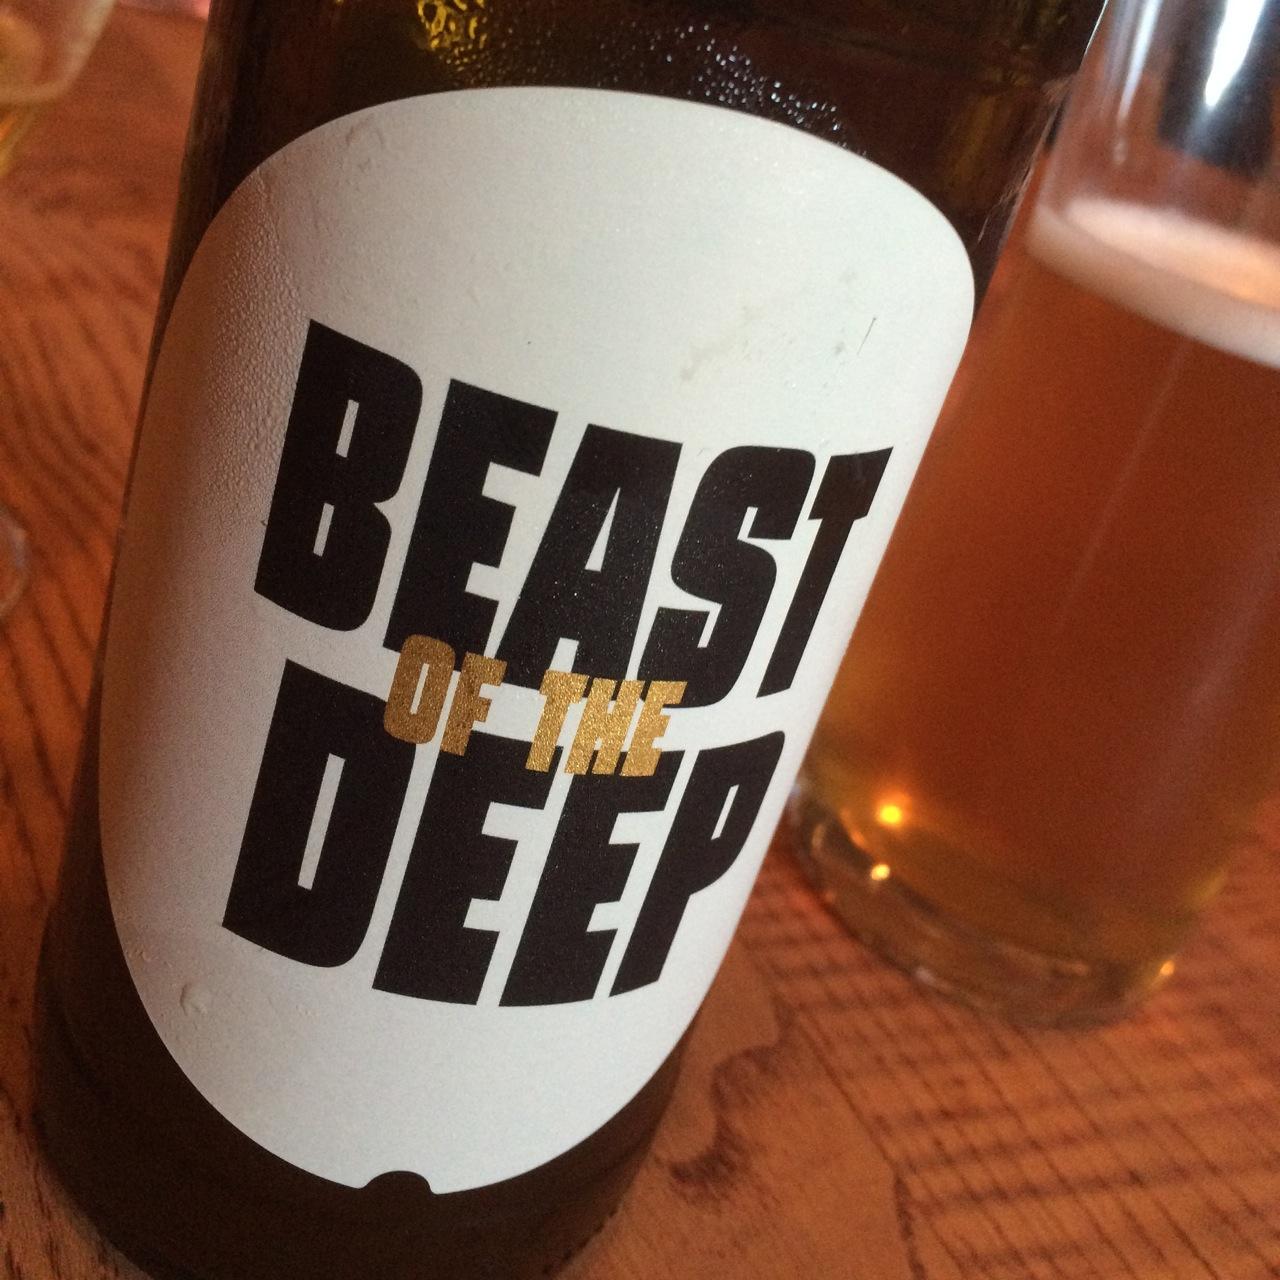 https://i0.wp.com/fatgayvegan.com/wp-content/uploads/2015/07/beast-of-the-deep.jpg?fit=1280%2C1280